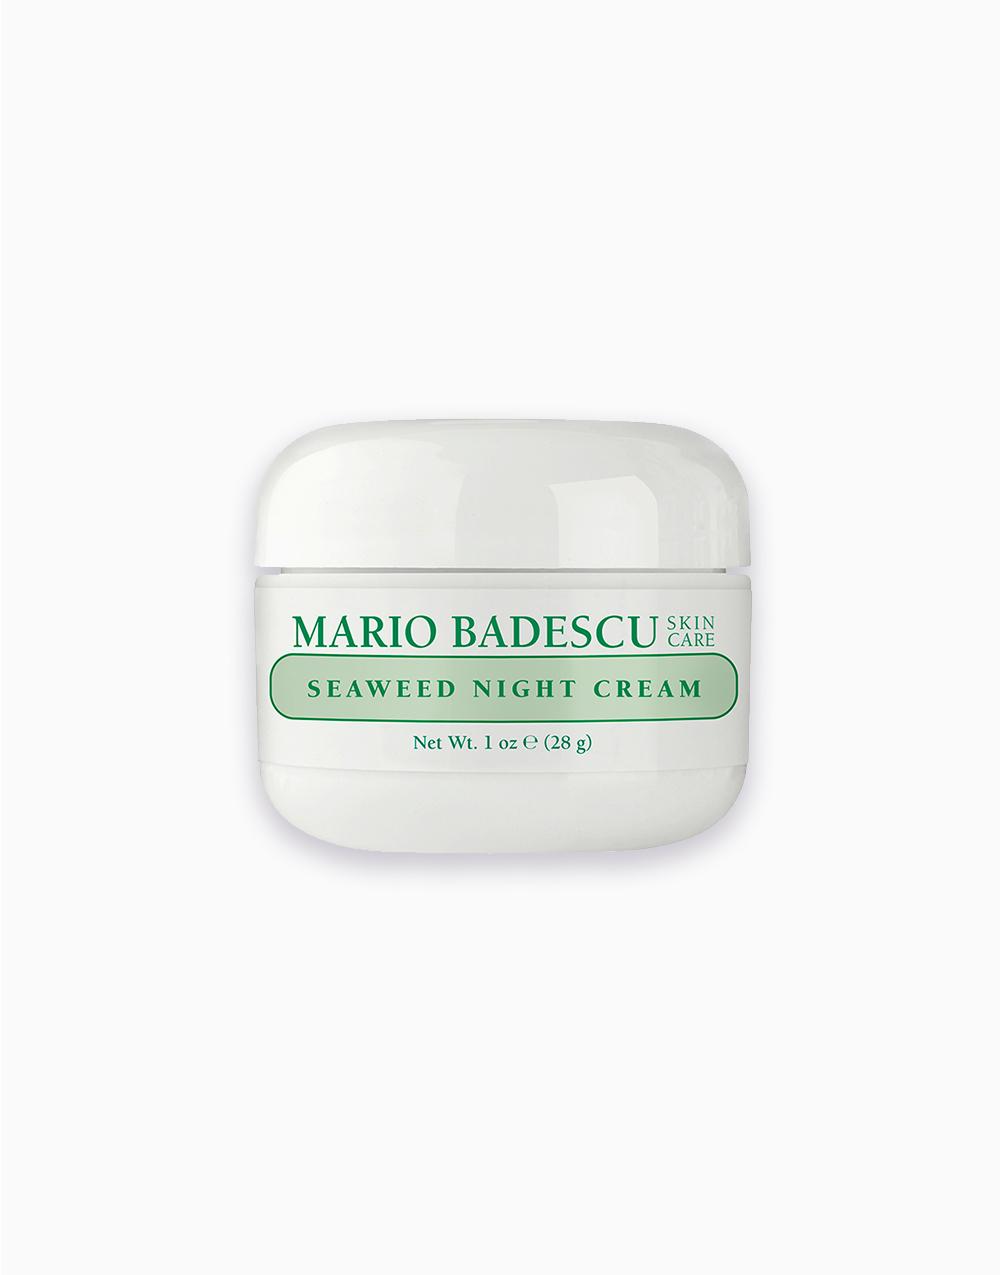 Seaweed Night Cream (1oz) by Mario Badescu